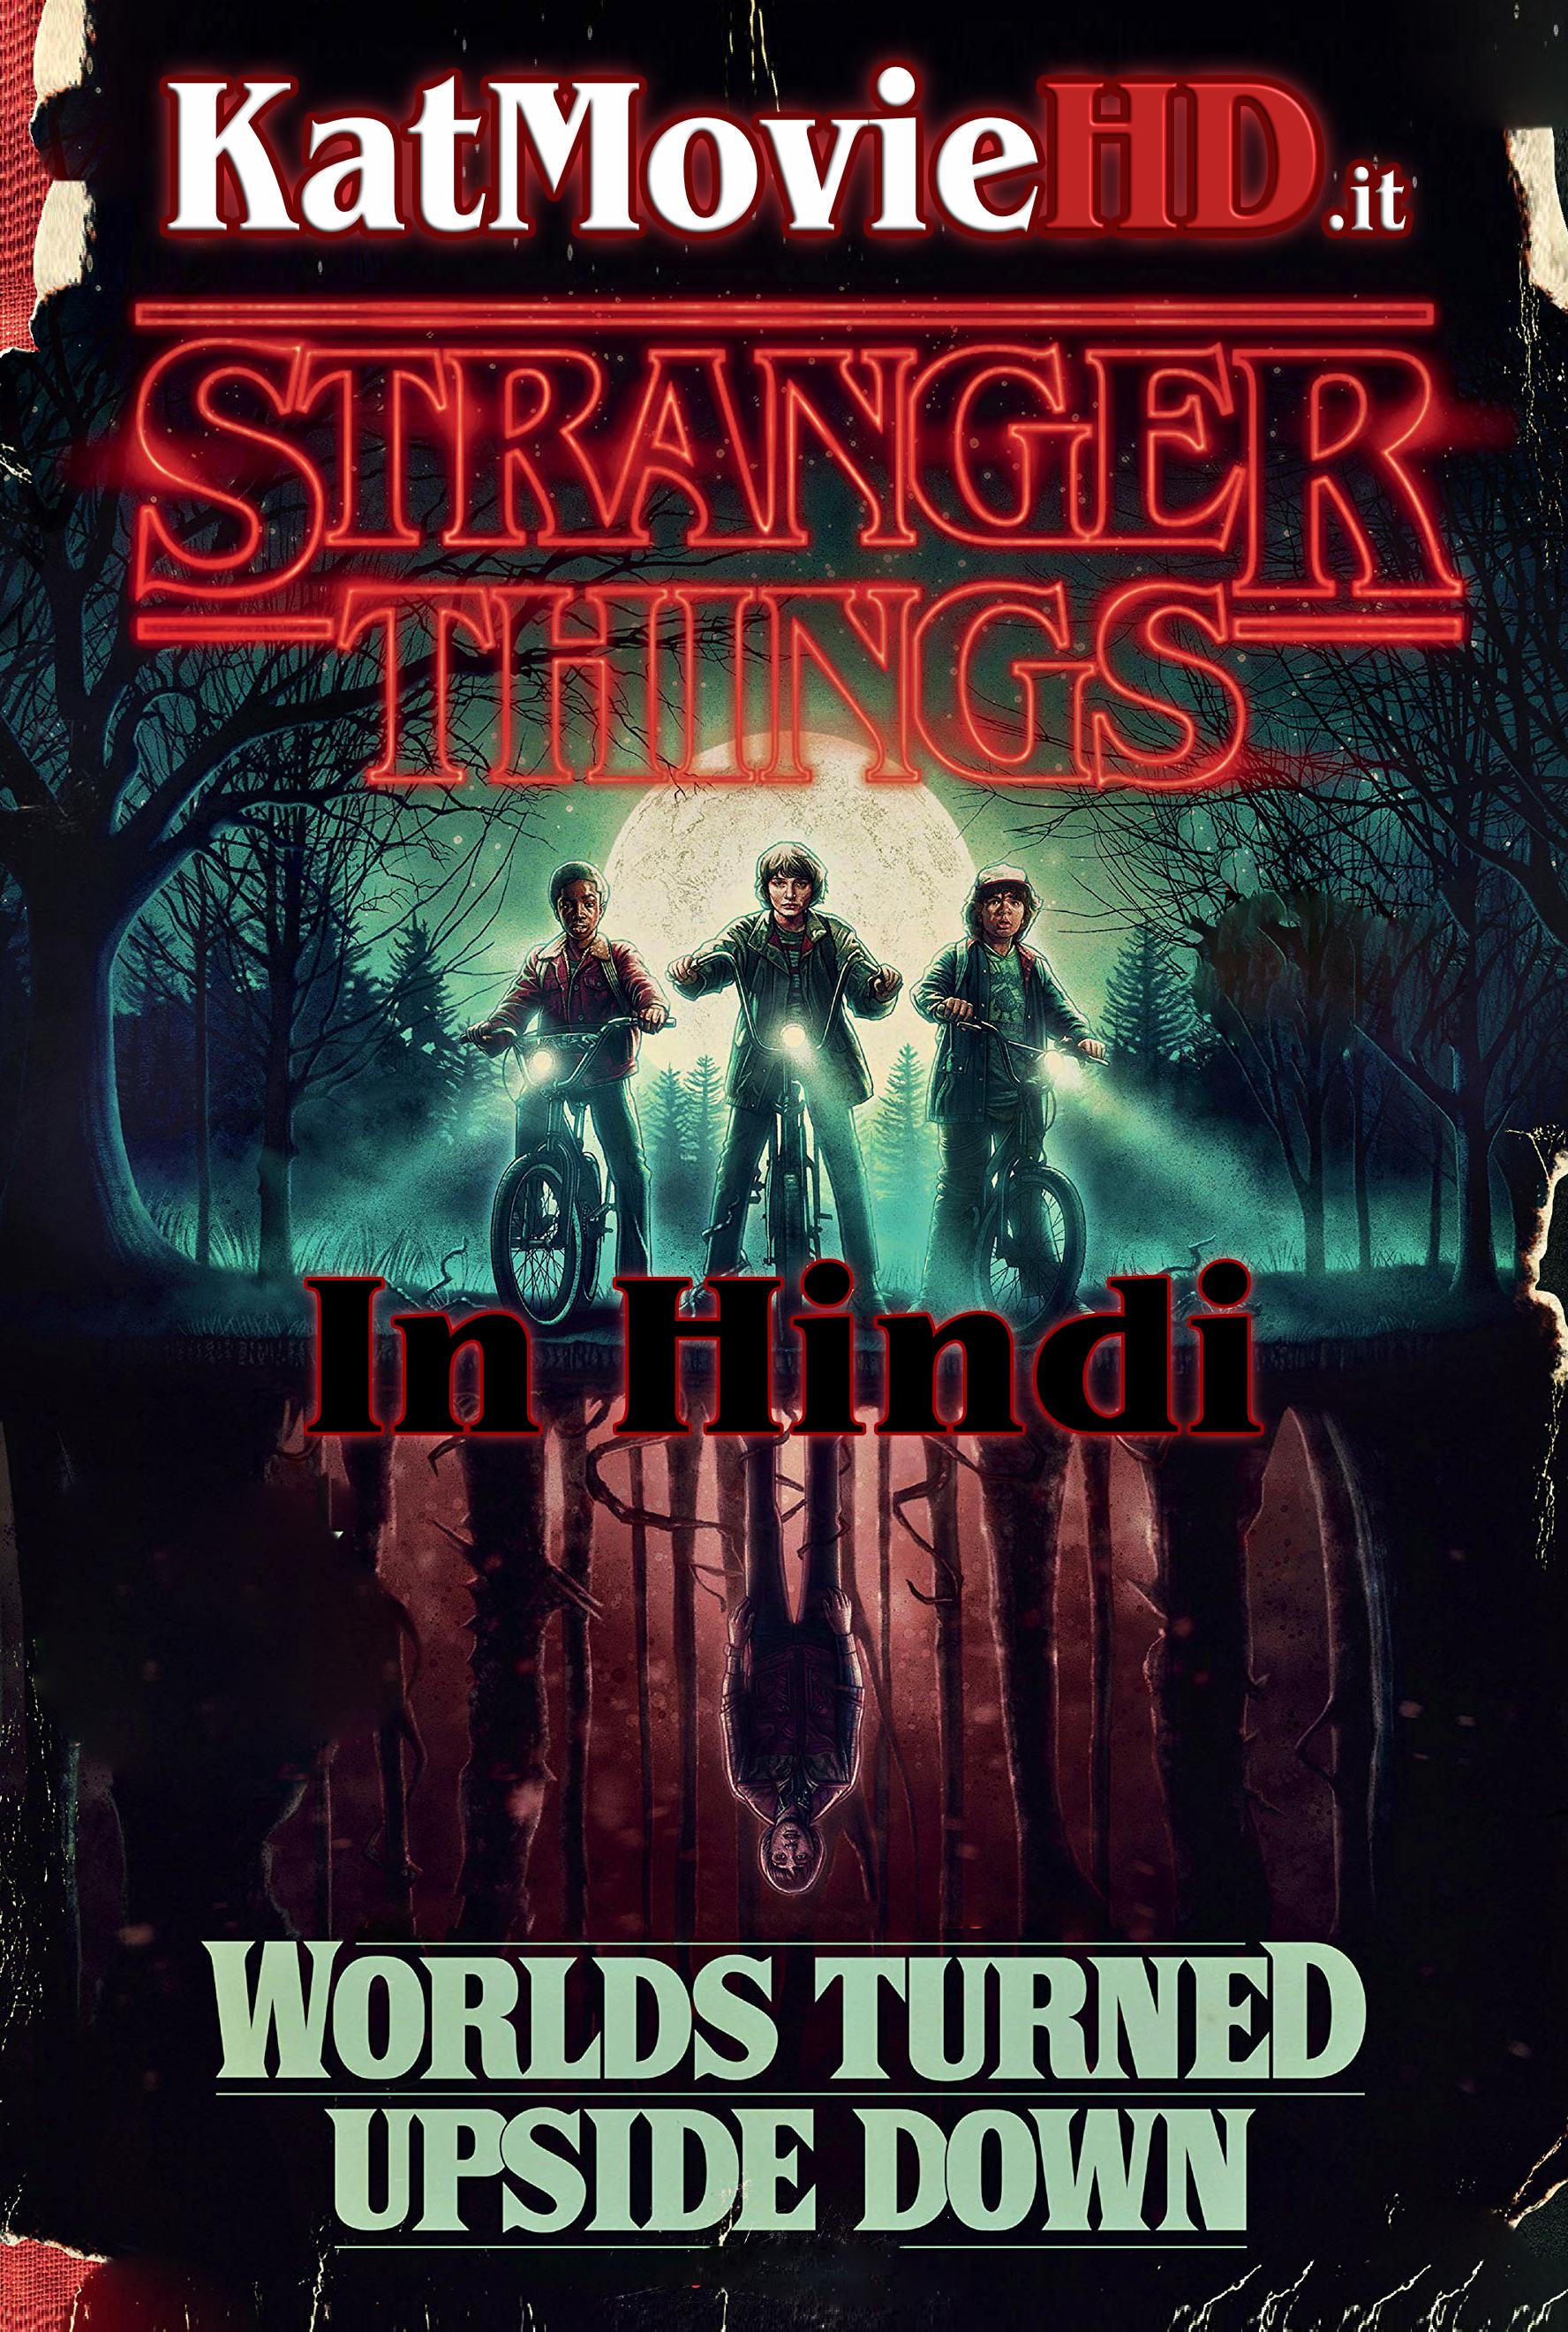 Stranger Things S01 Complete Season 1 Dual Audio In Hindi 5 1